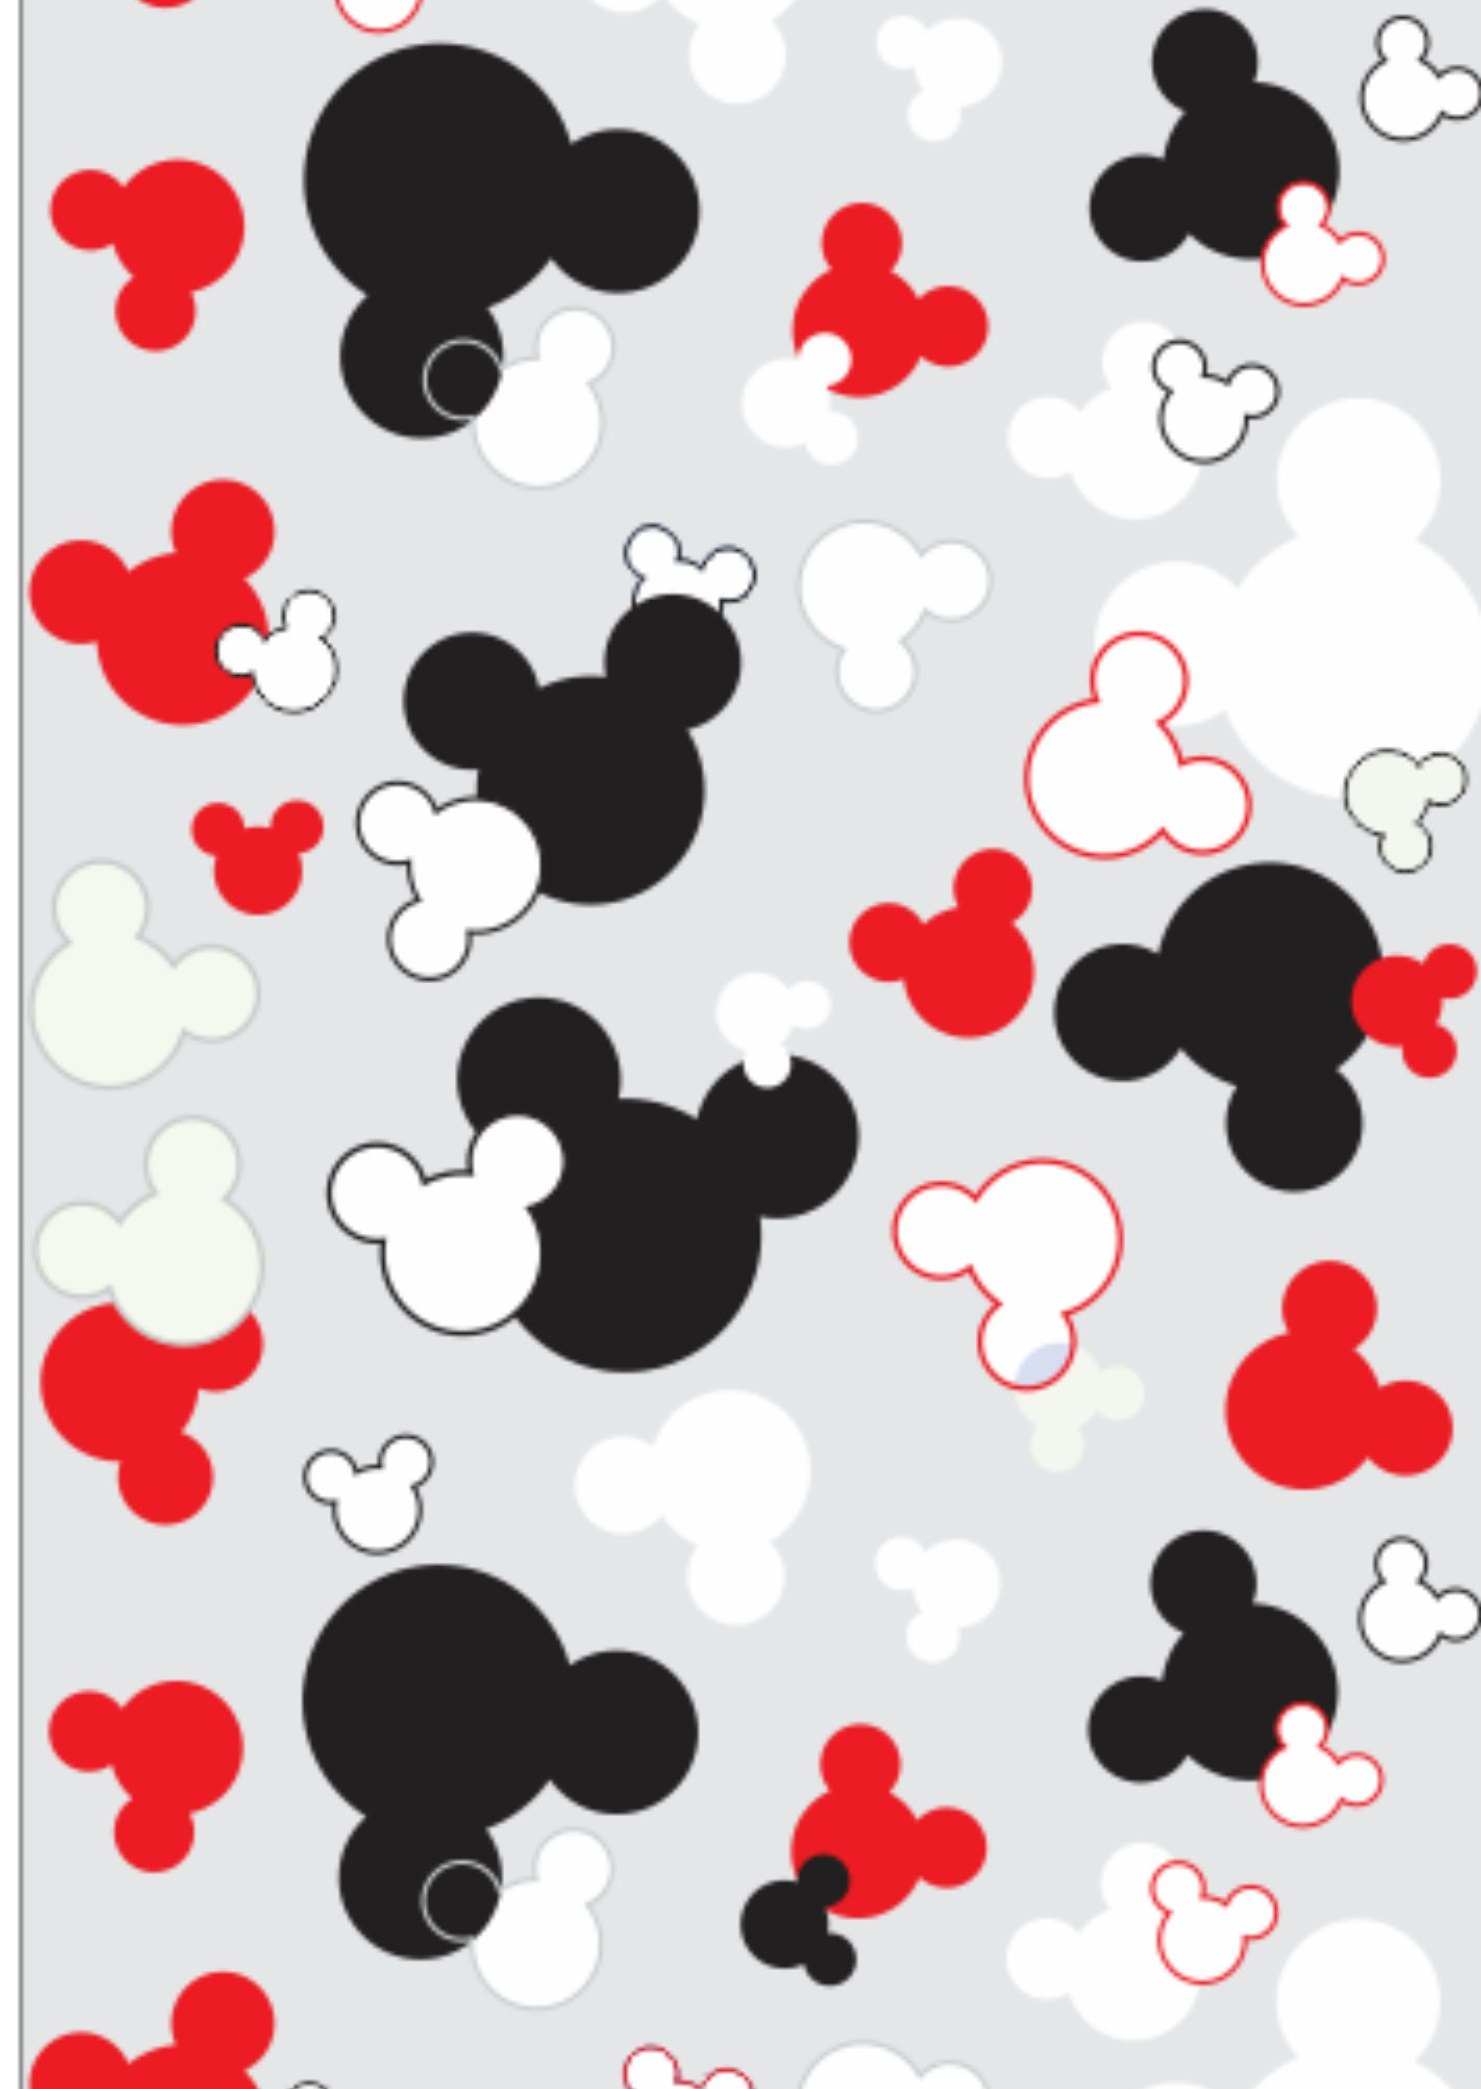 Papel de parede disney mickey mouse 02 crie decore elo7 - Papel para paredes decorativo ...